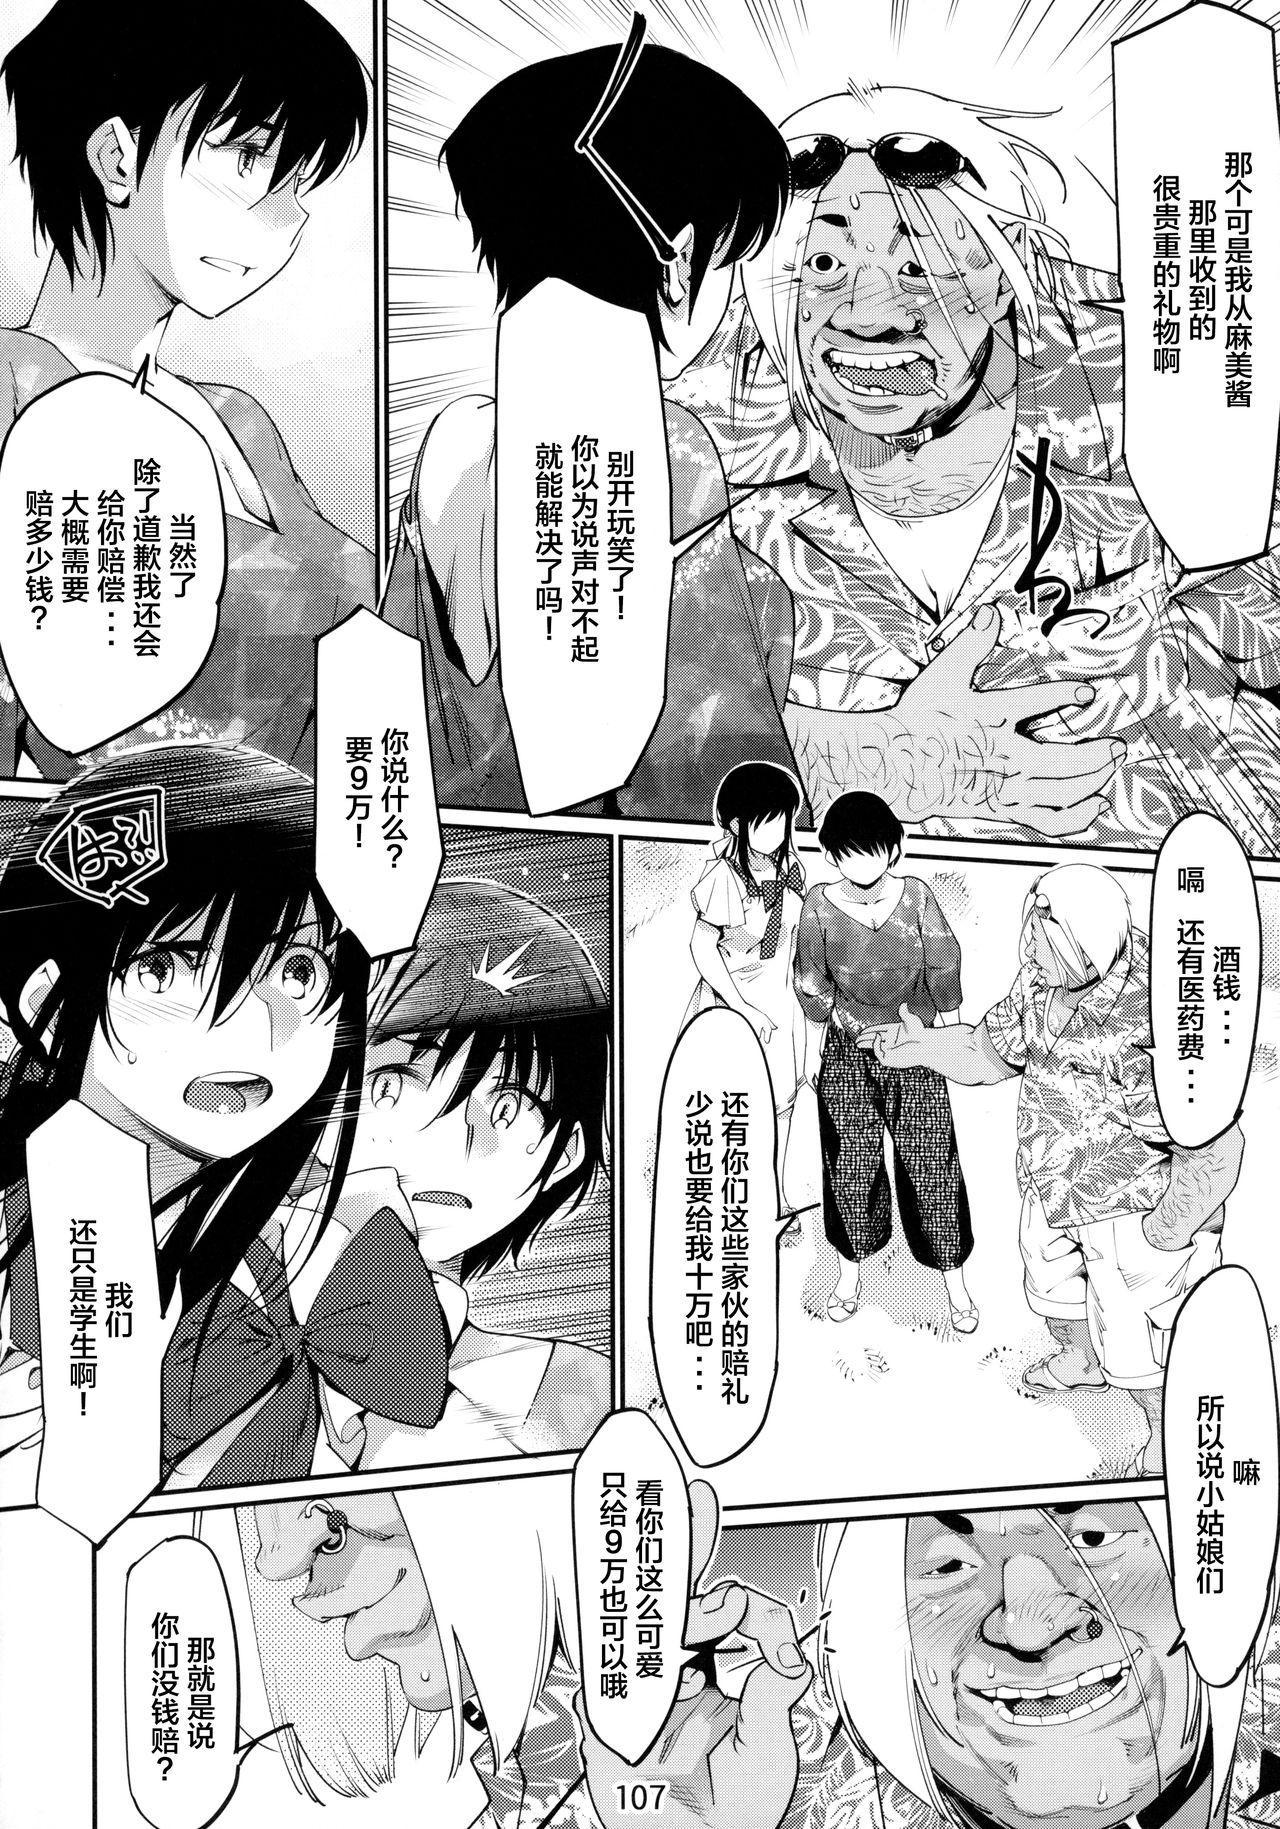 Otonano Omochiya 6 Kan 106